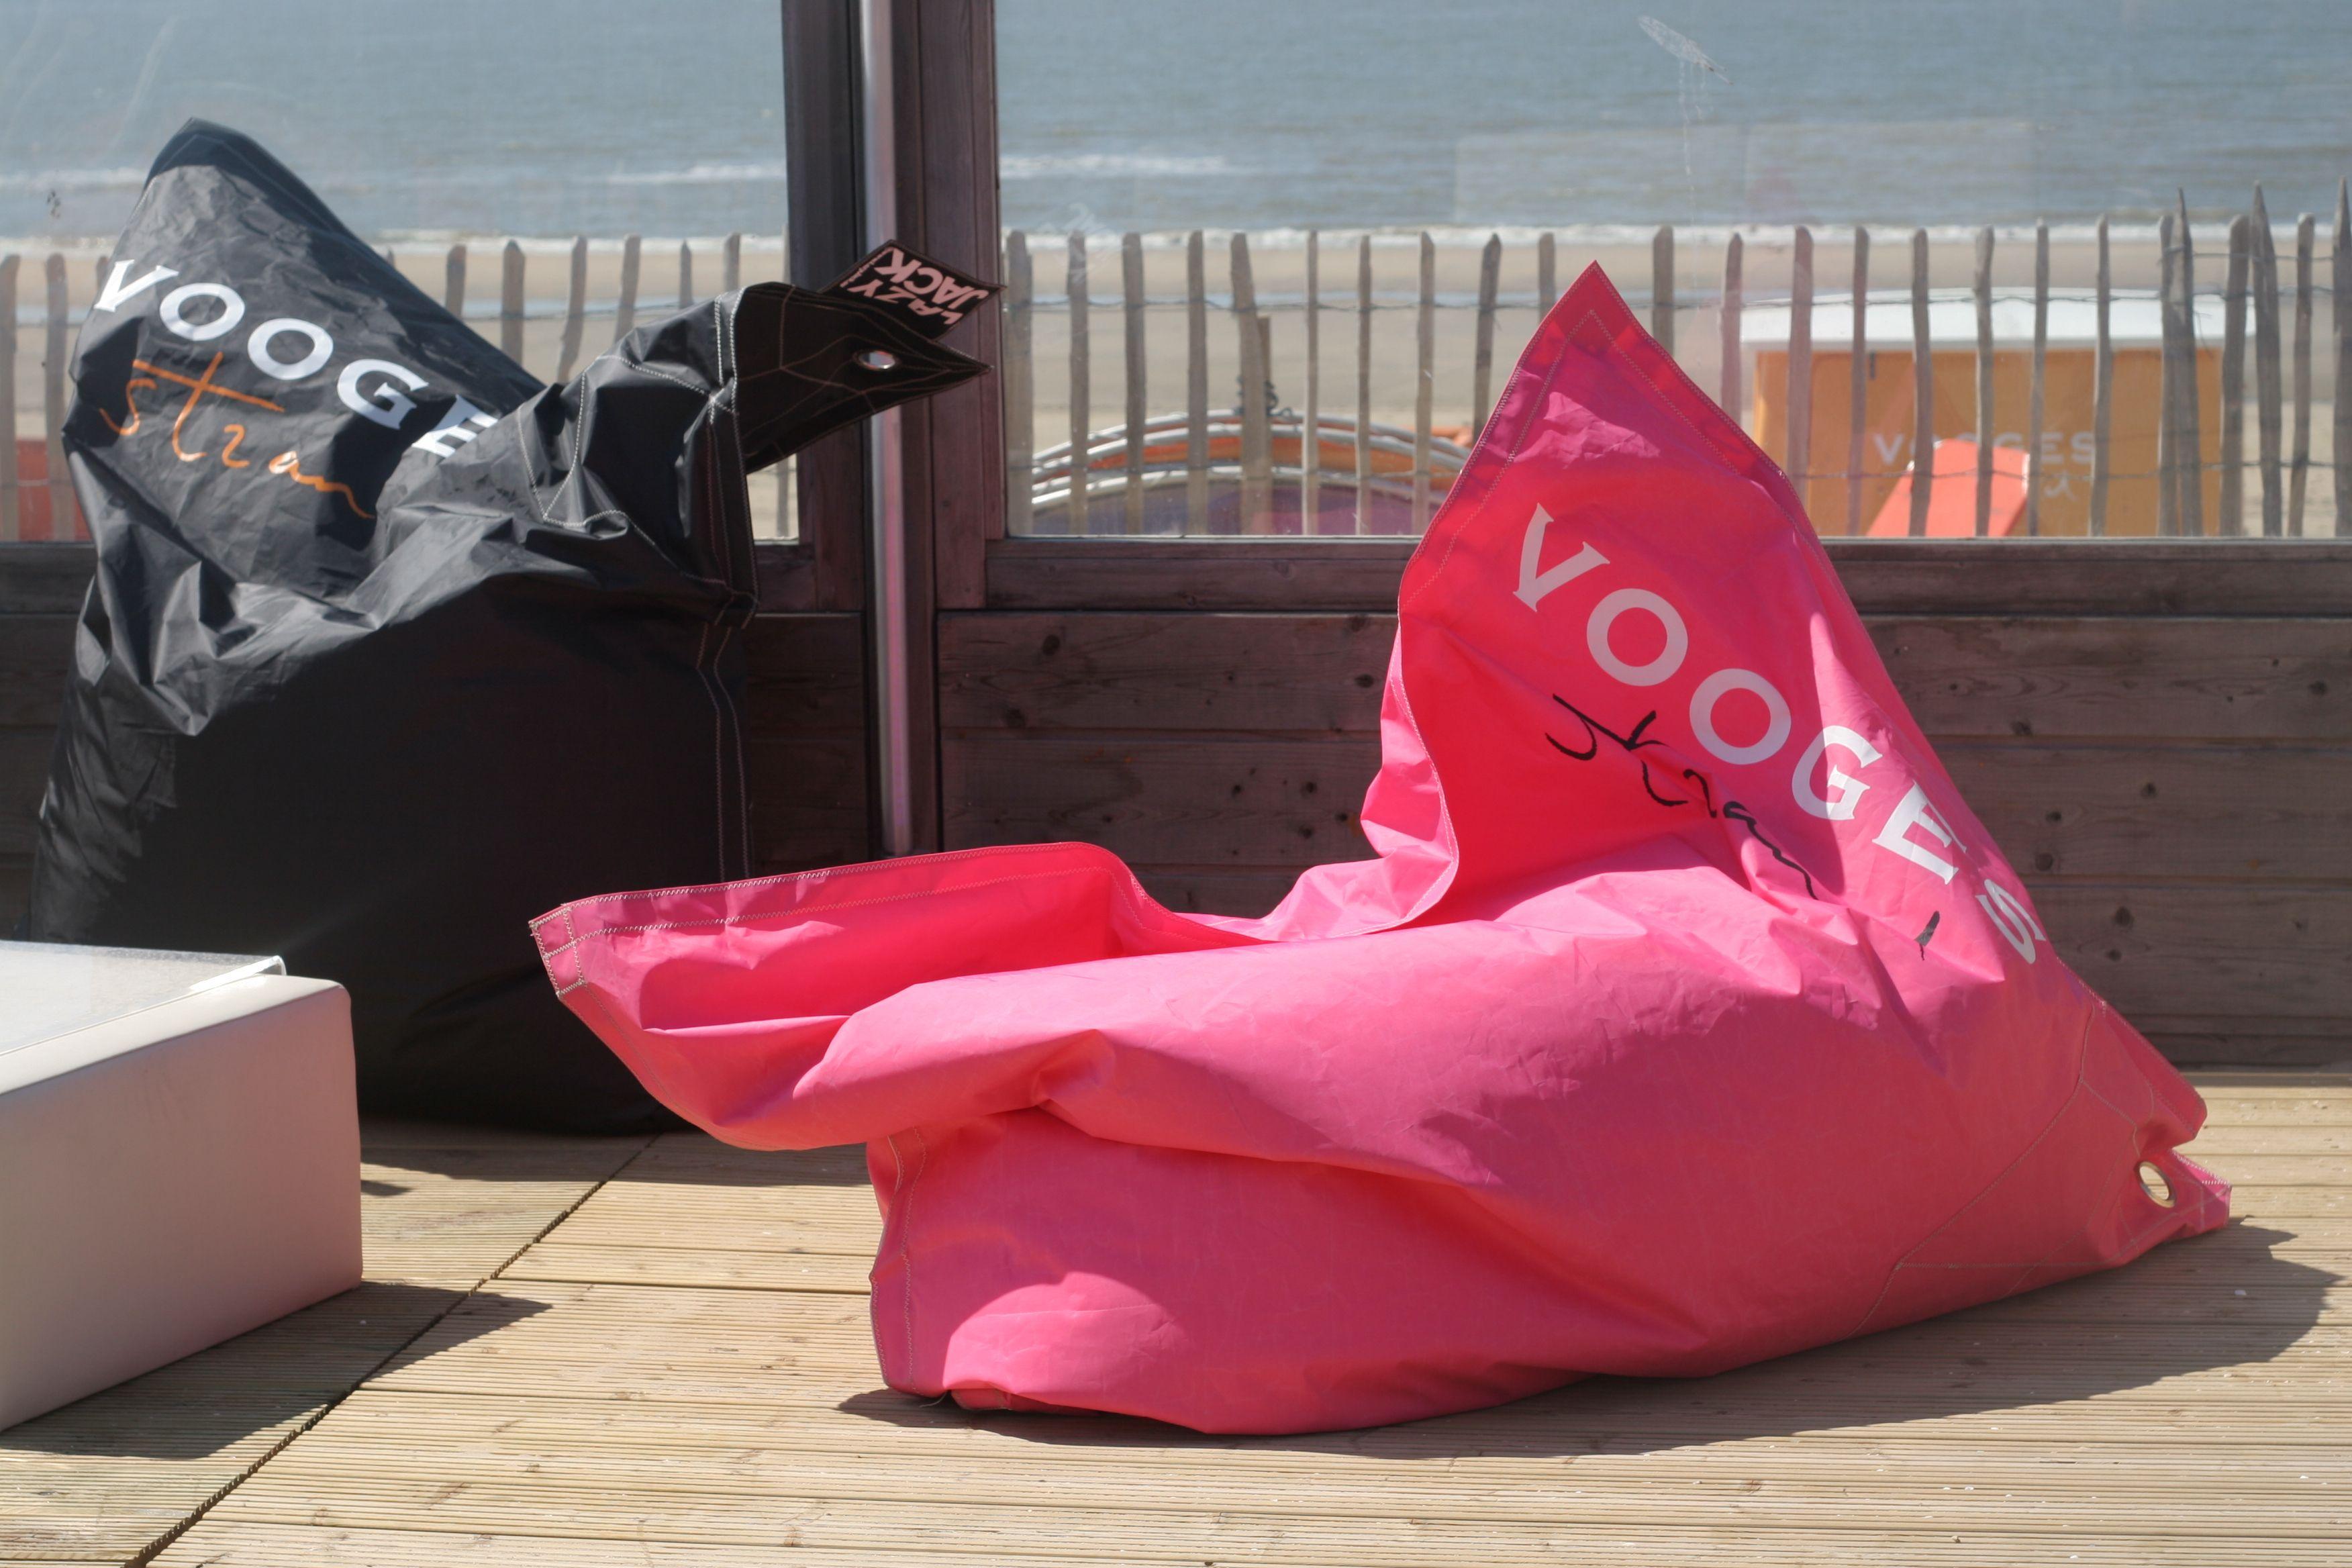 Lazy Jack Personalised Bean Bags Vooges Beach Club Zandvoort The Netherlands